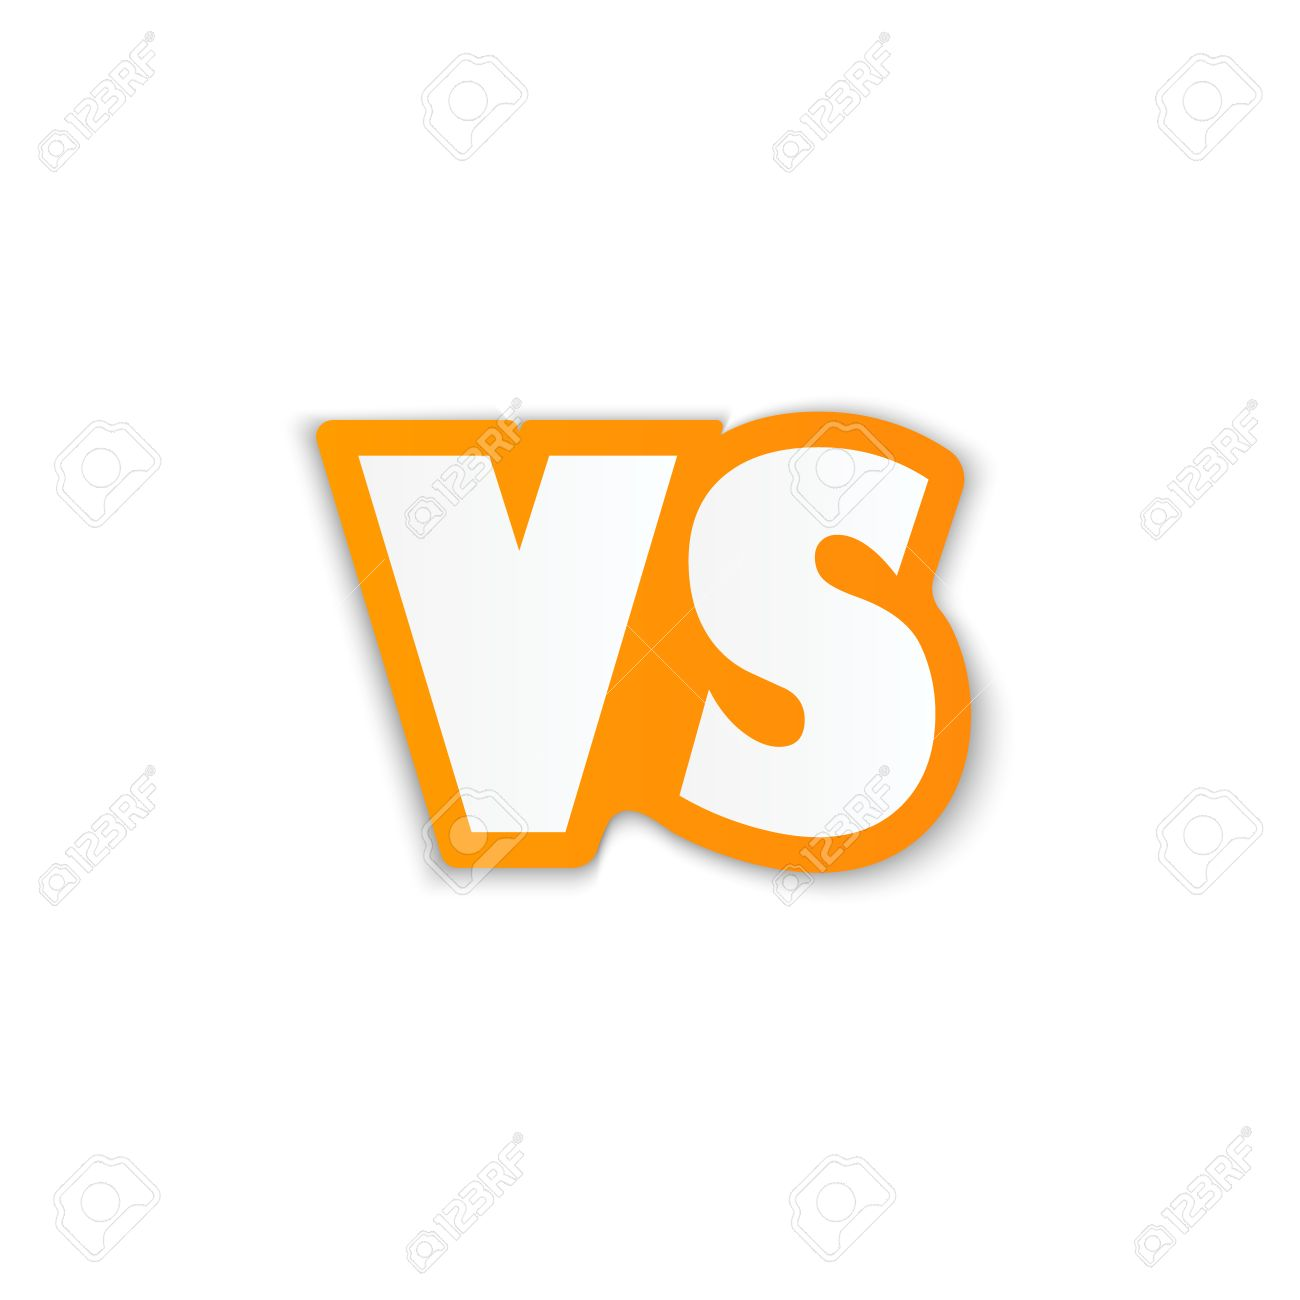 Background image vs background - Versus Logo Vs Vector Letters Illustration Isolated On White Background Stock Vector 49362347